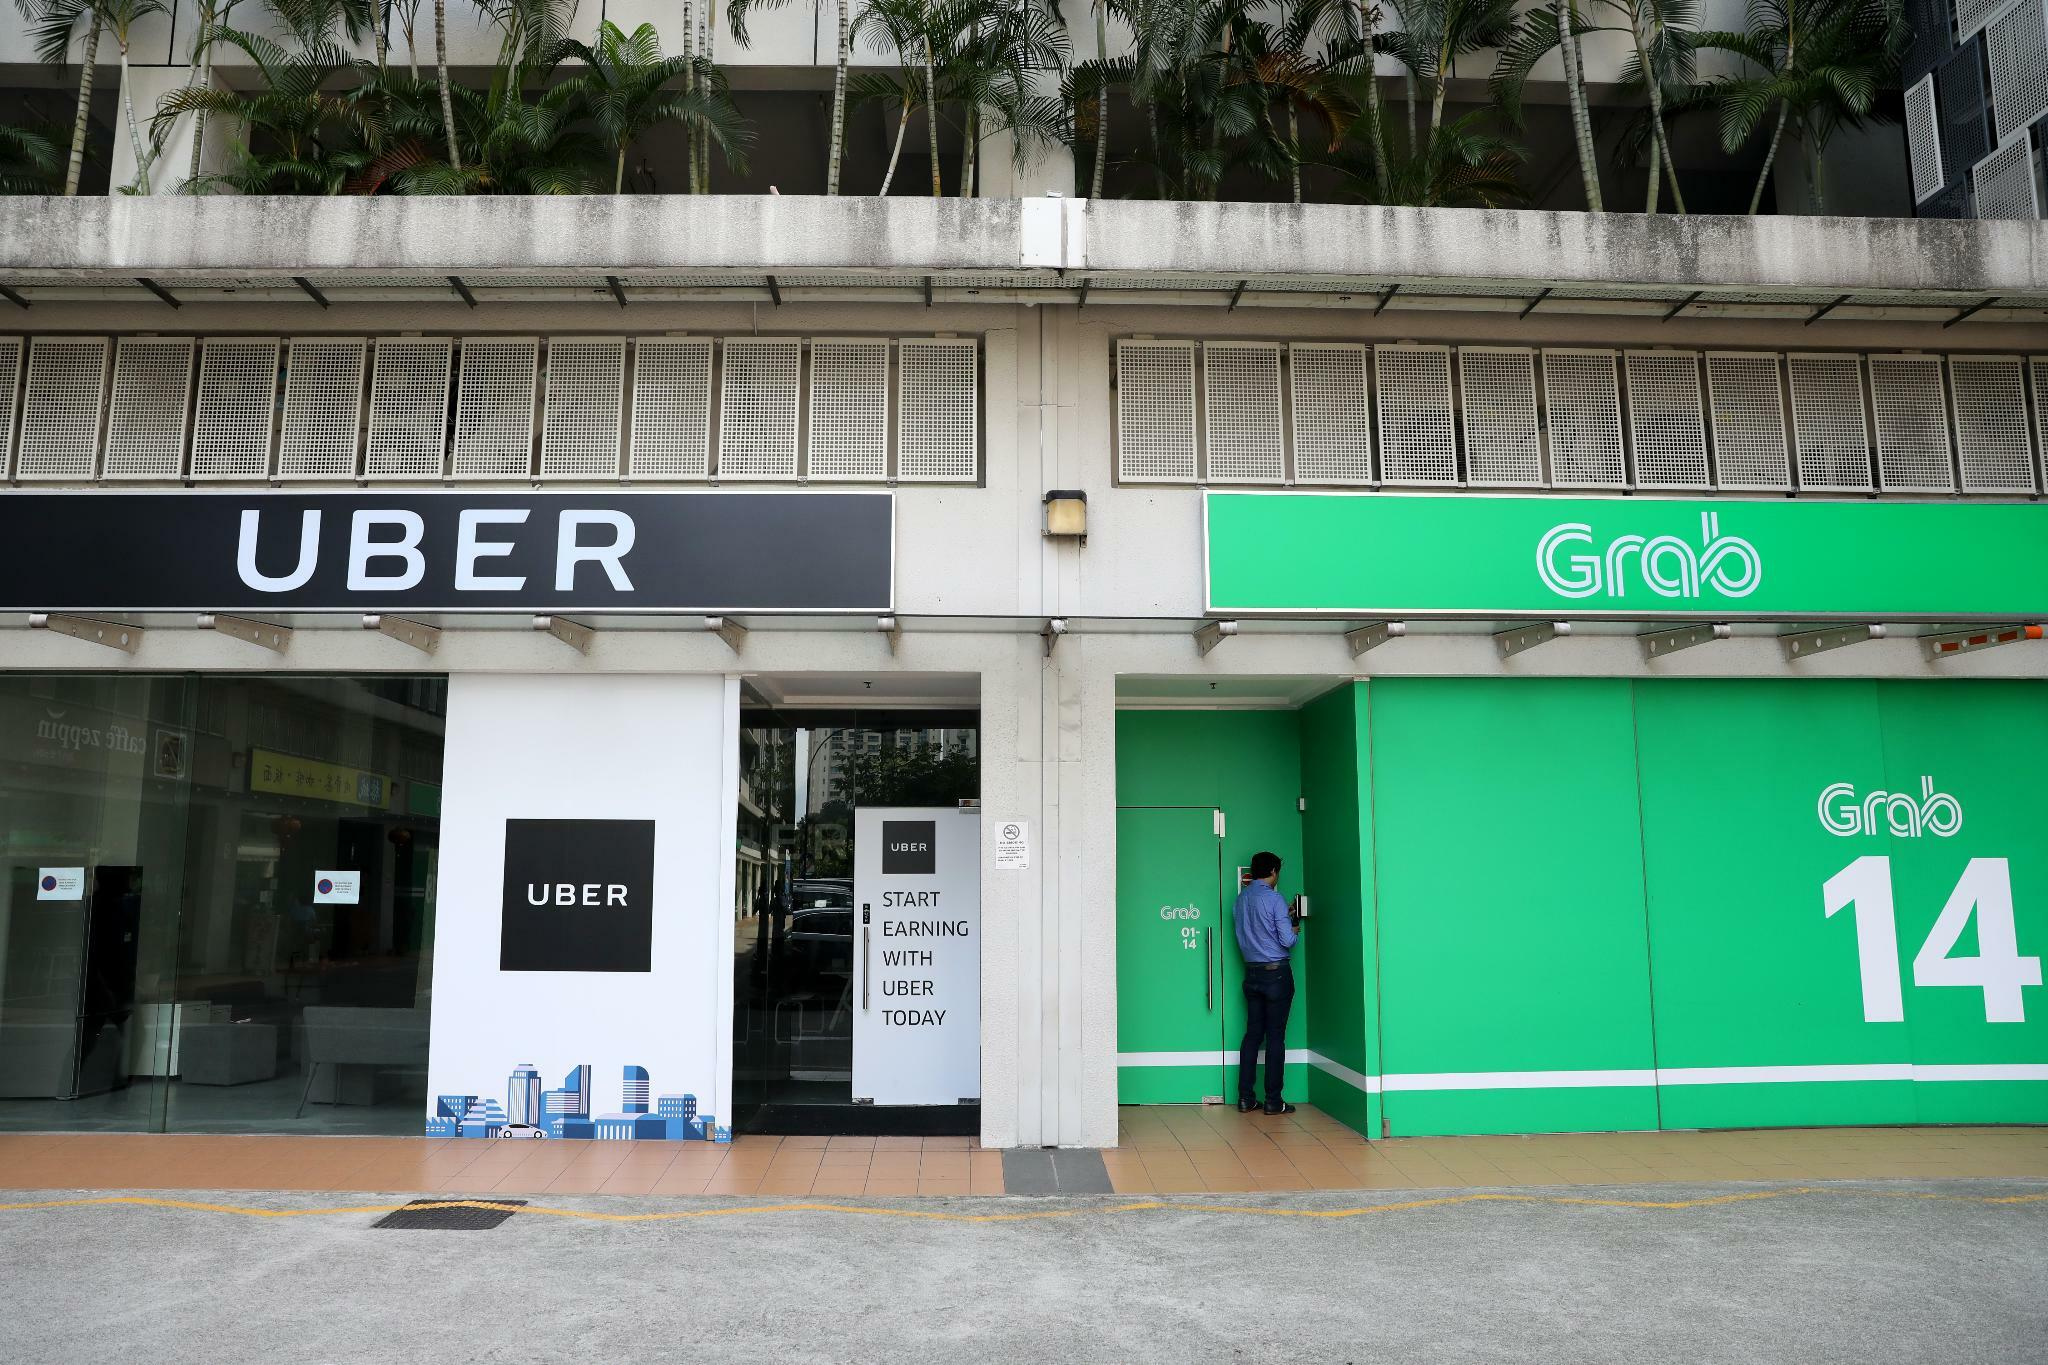 Uber-Konkurrent Grab plant Millioneninvestition in Vietnam